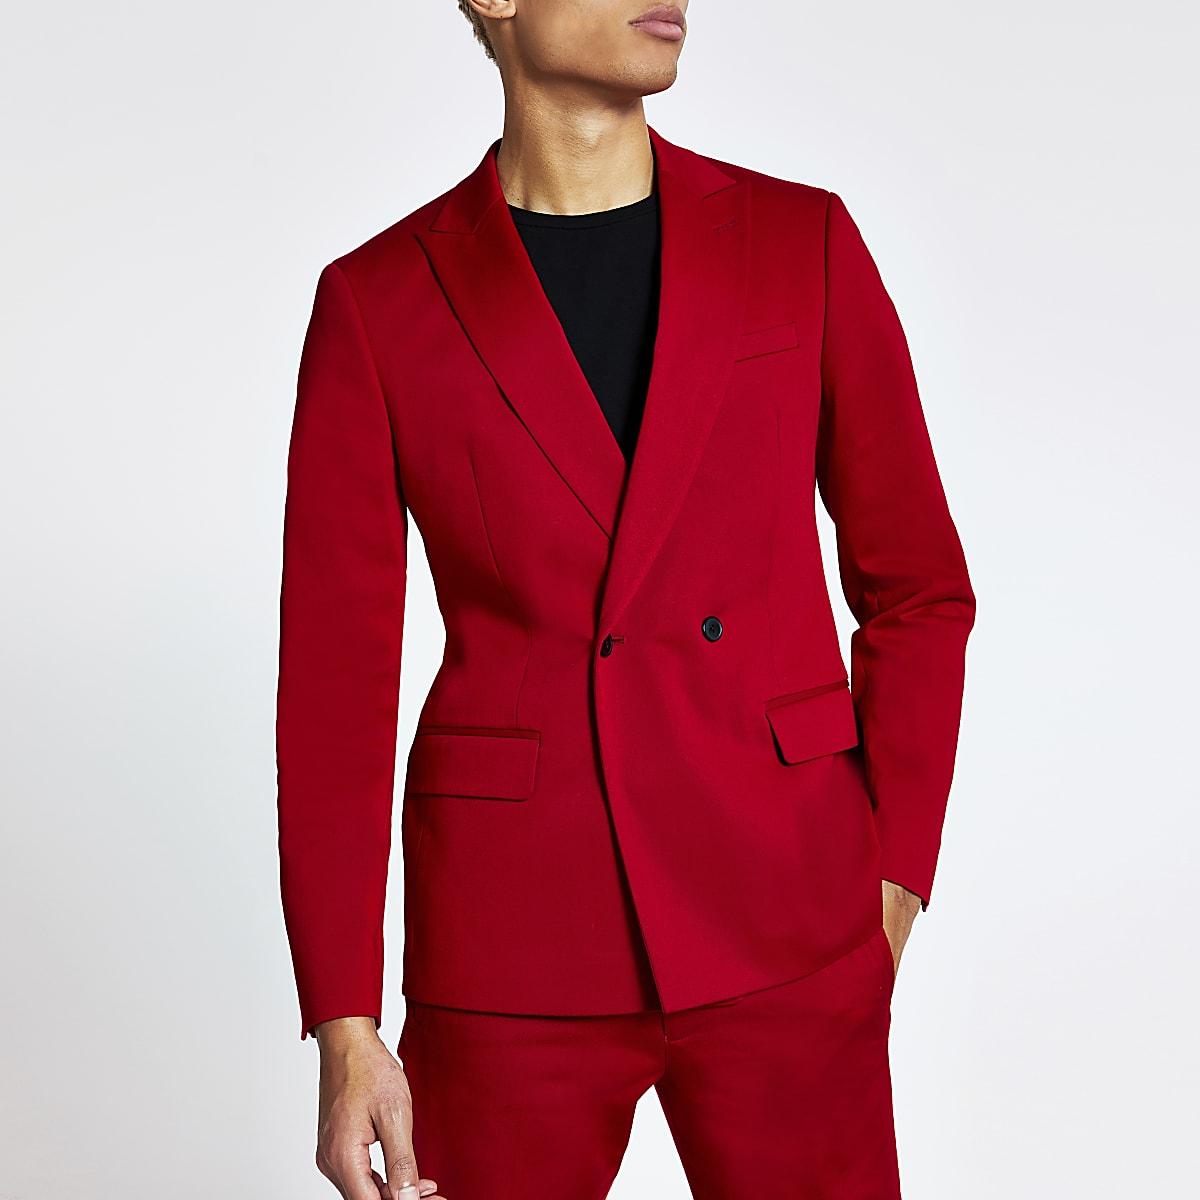 Veste de costume rouge croisée coupe skinny